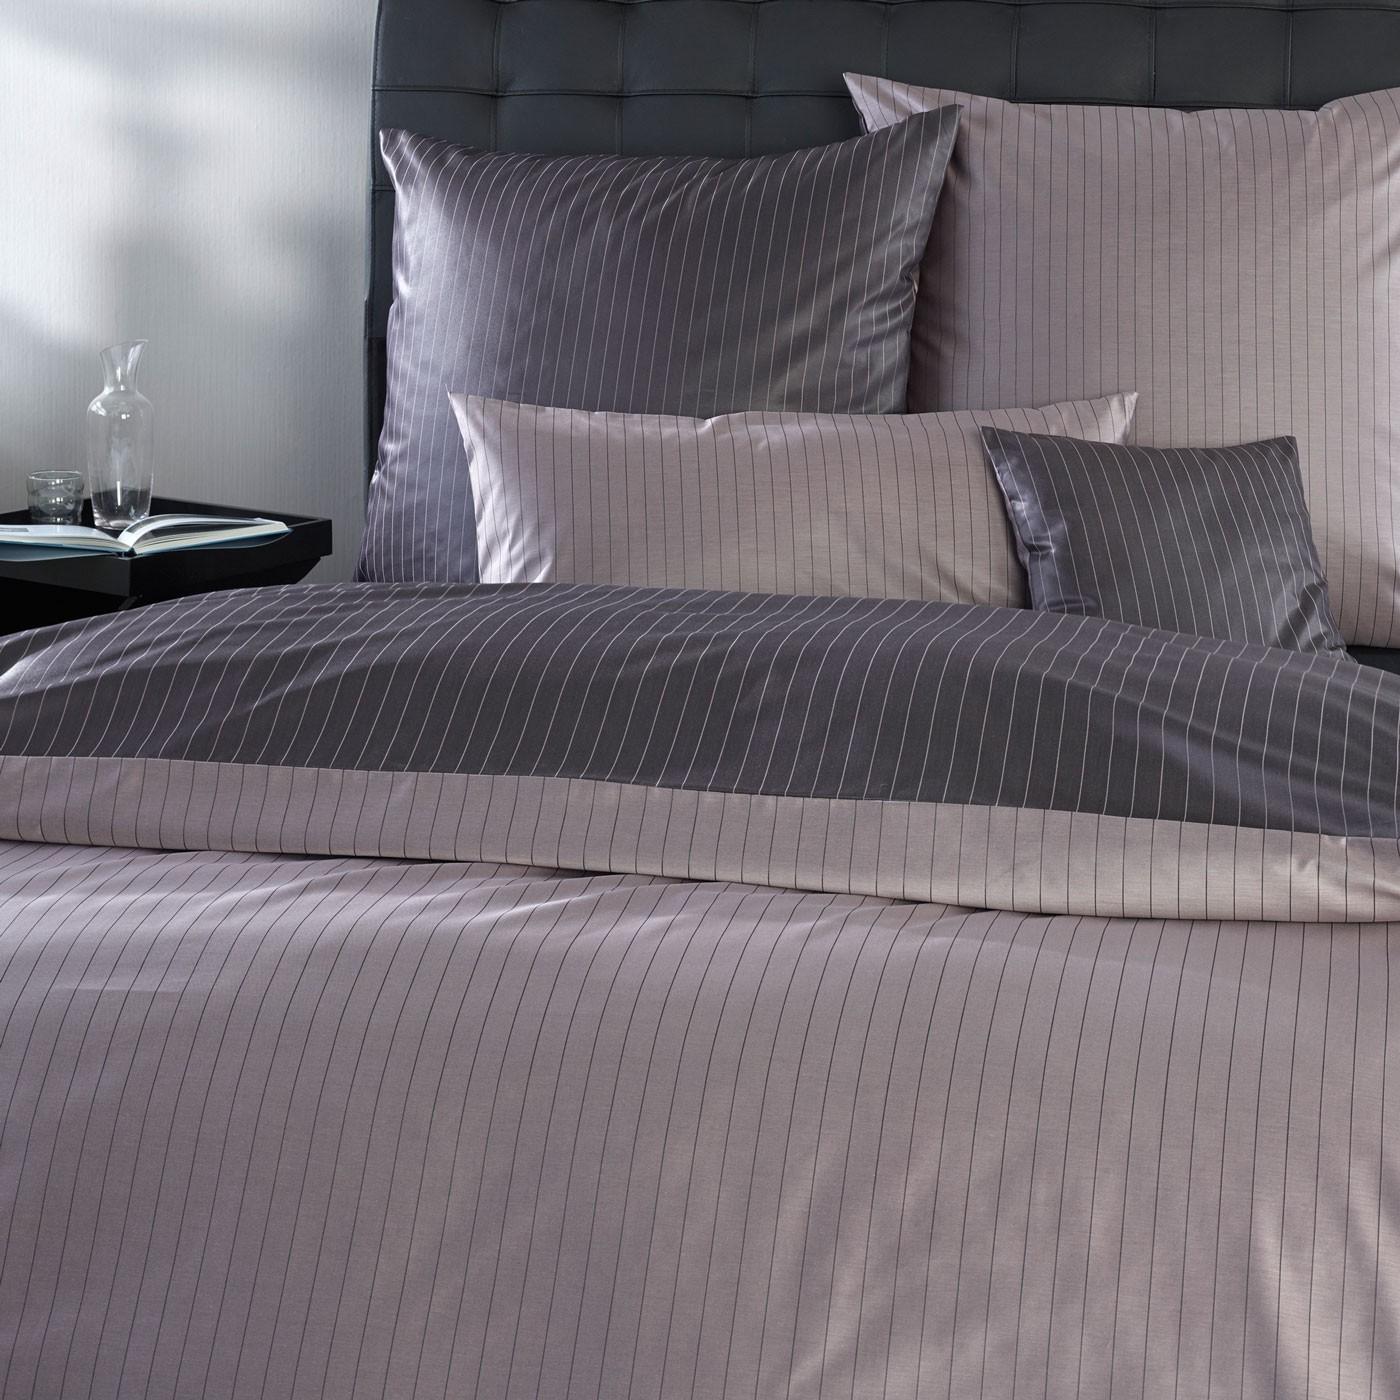 bettw sche curt bauer ferrara 2452 cassis. Black Bedroom Furniture Sets. Home Design Ideas